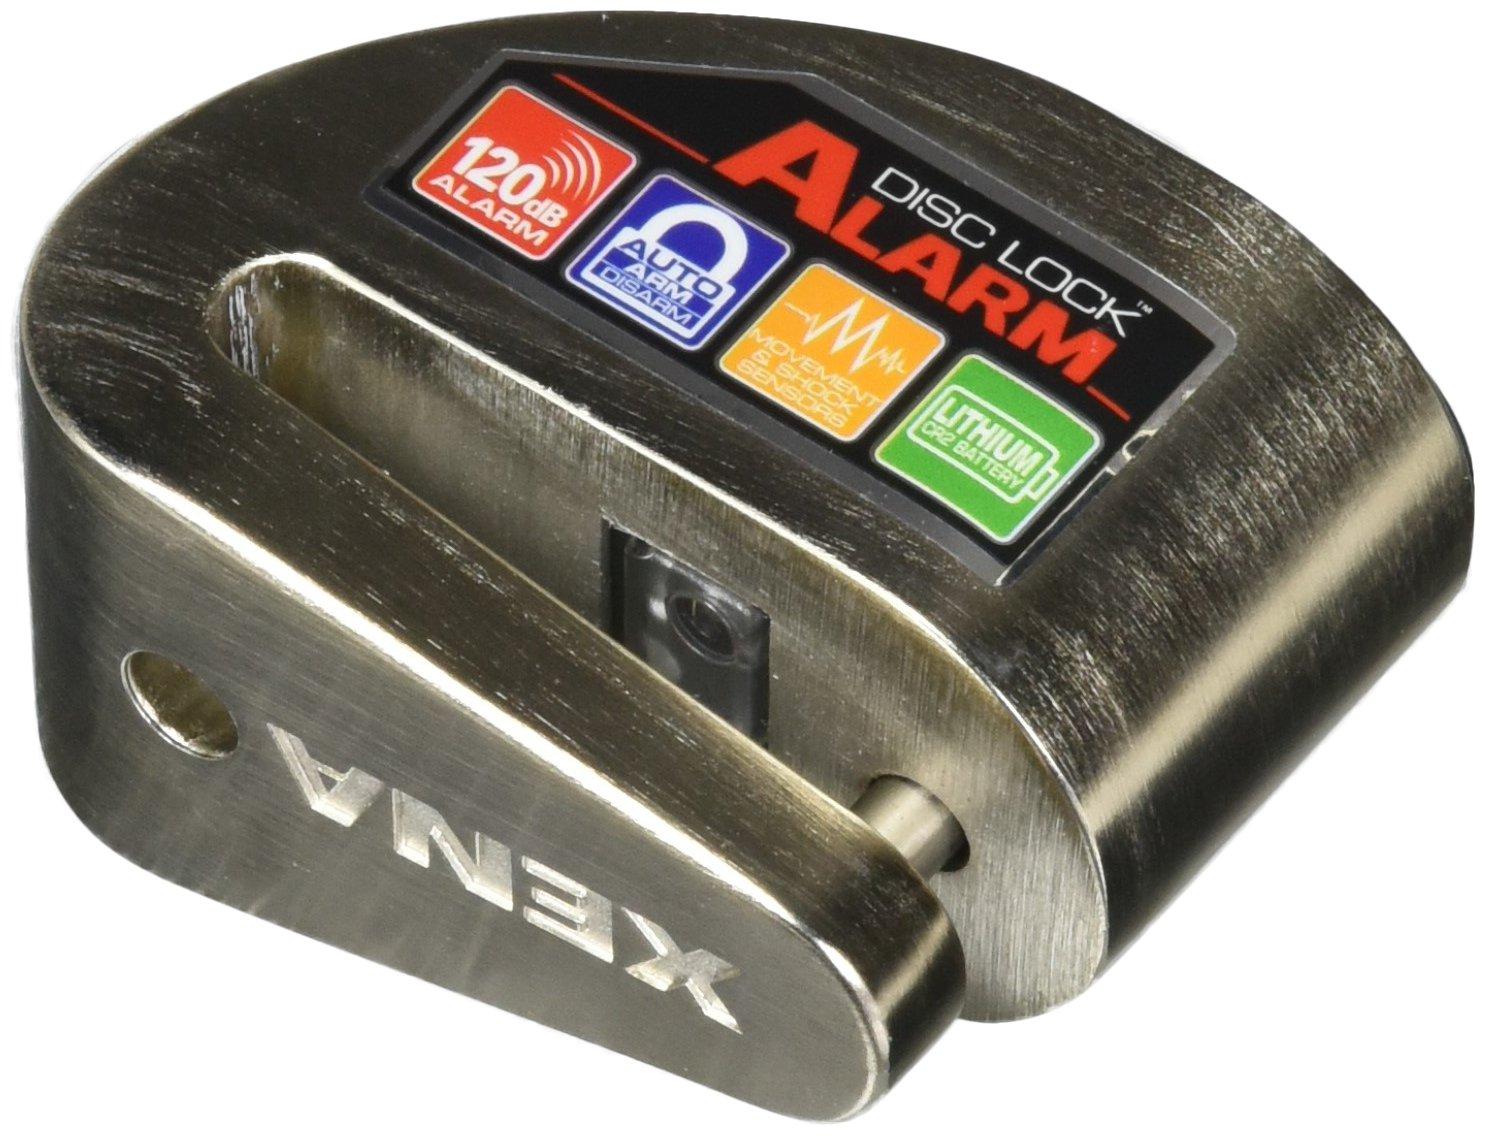 Xena (XZZ6L-SS Disc-Lock Alarm, Stainless Steel